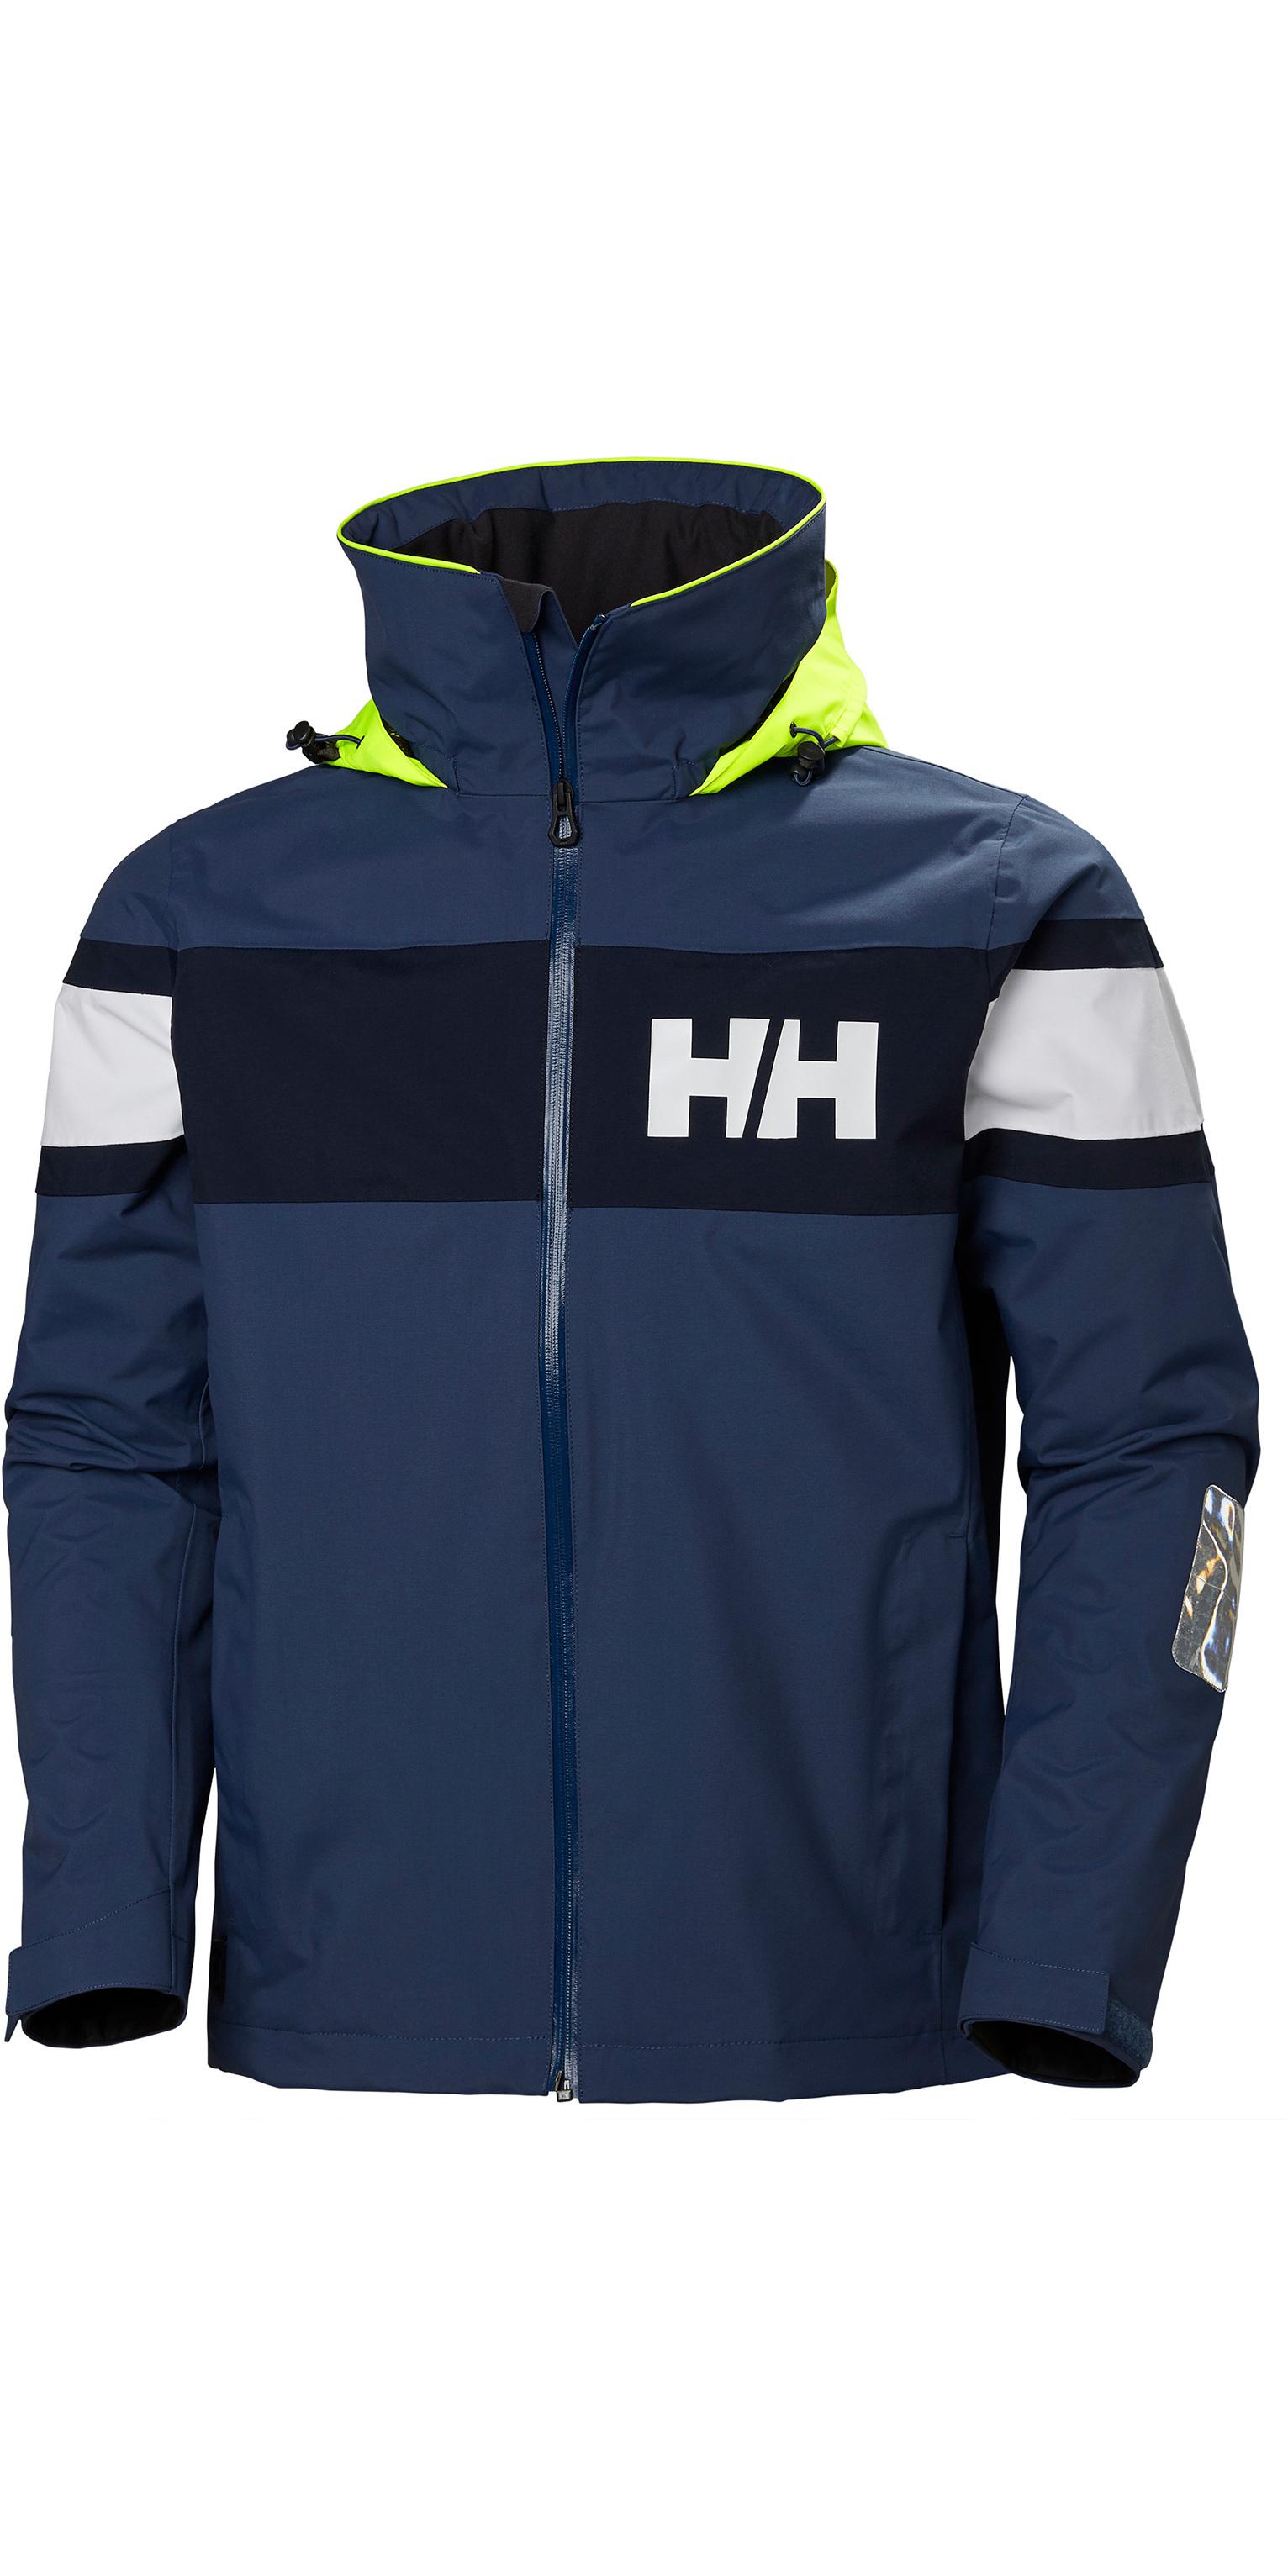 2019 Helly Hansen Mens Salt Flag Jacket Graphite Blue 33909